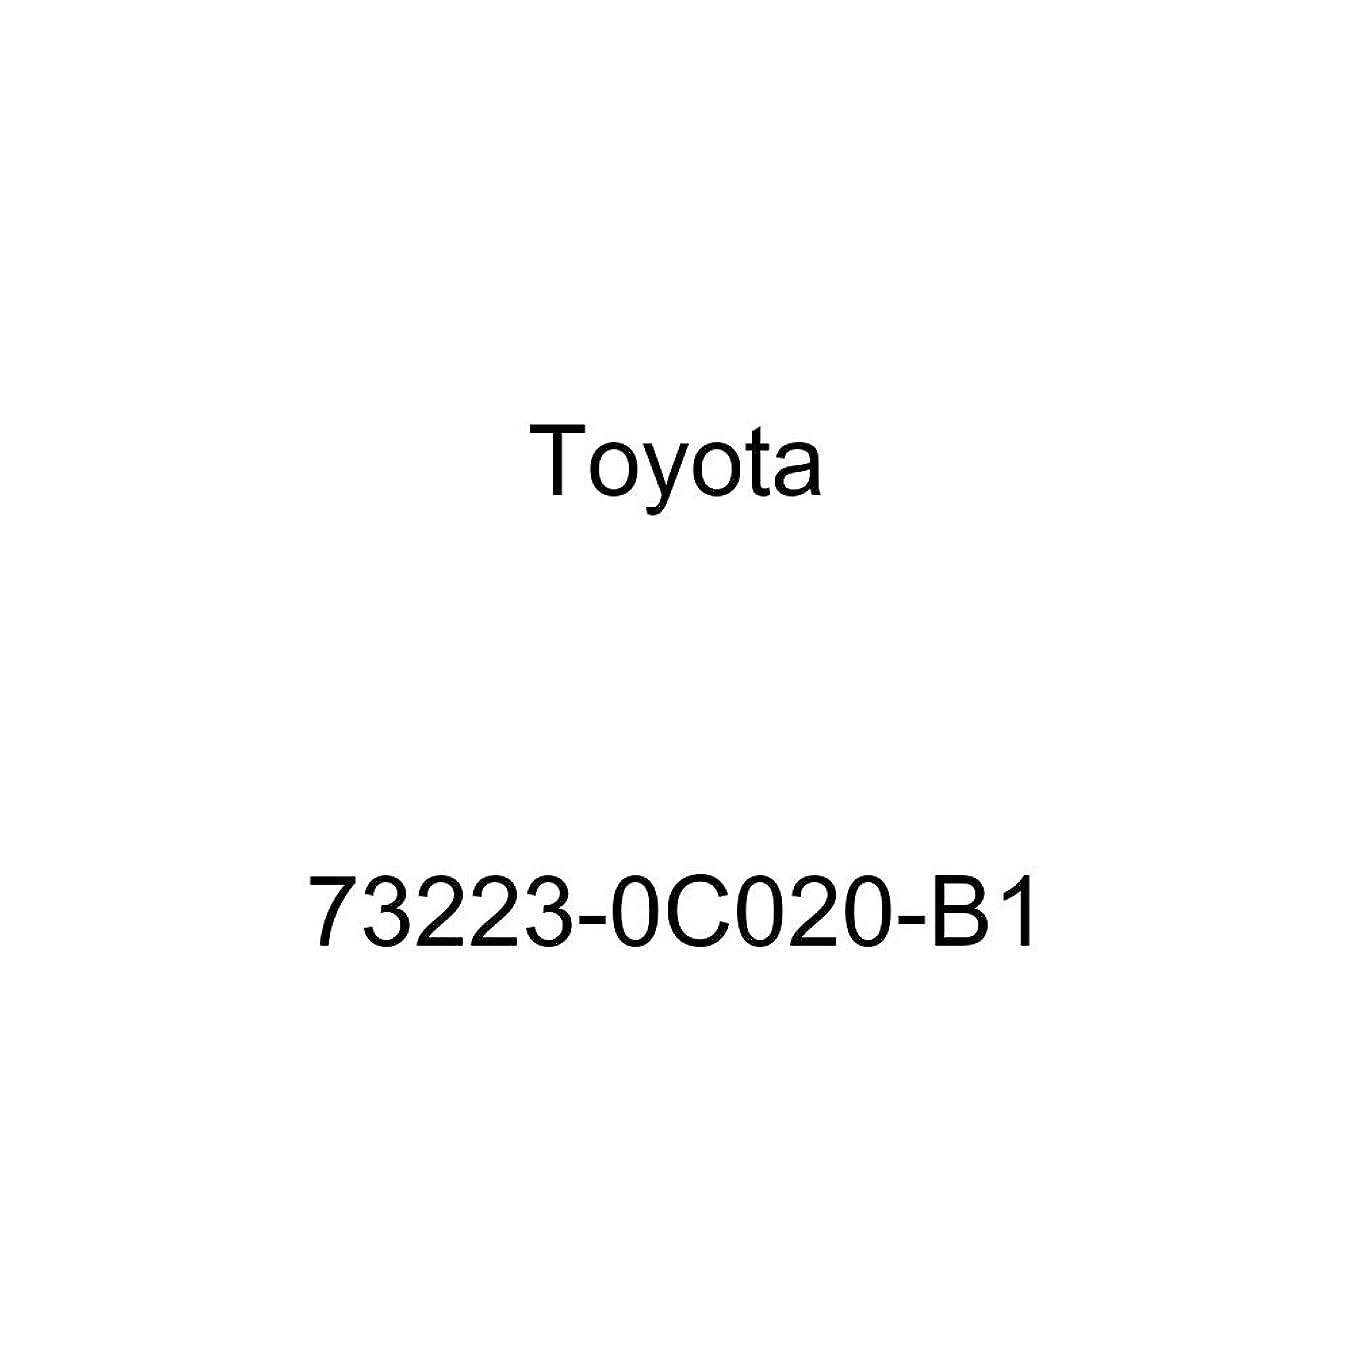 Genuine Toyota 73223-0C020-B1 Seat Belt Retractor Cover